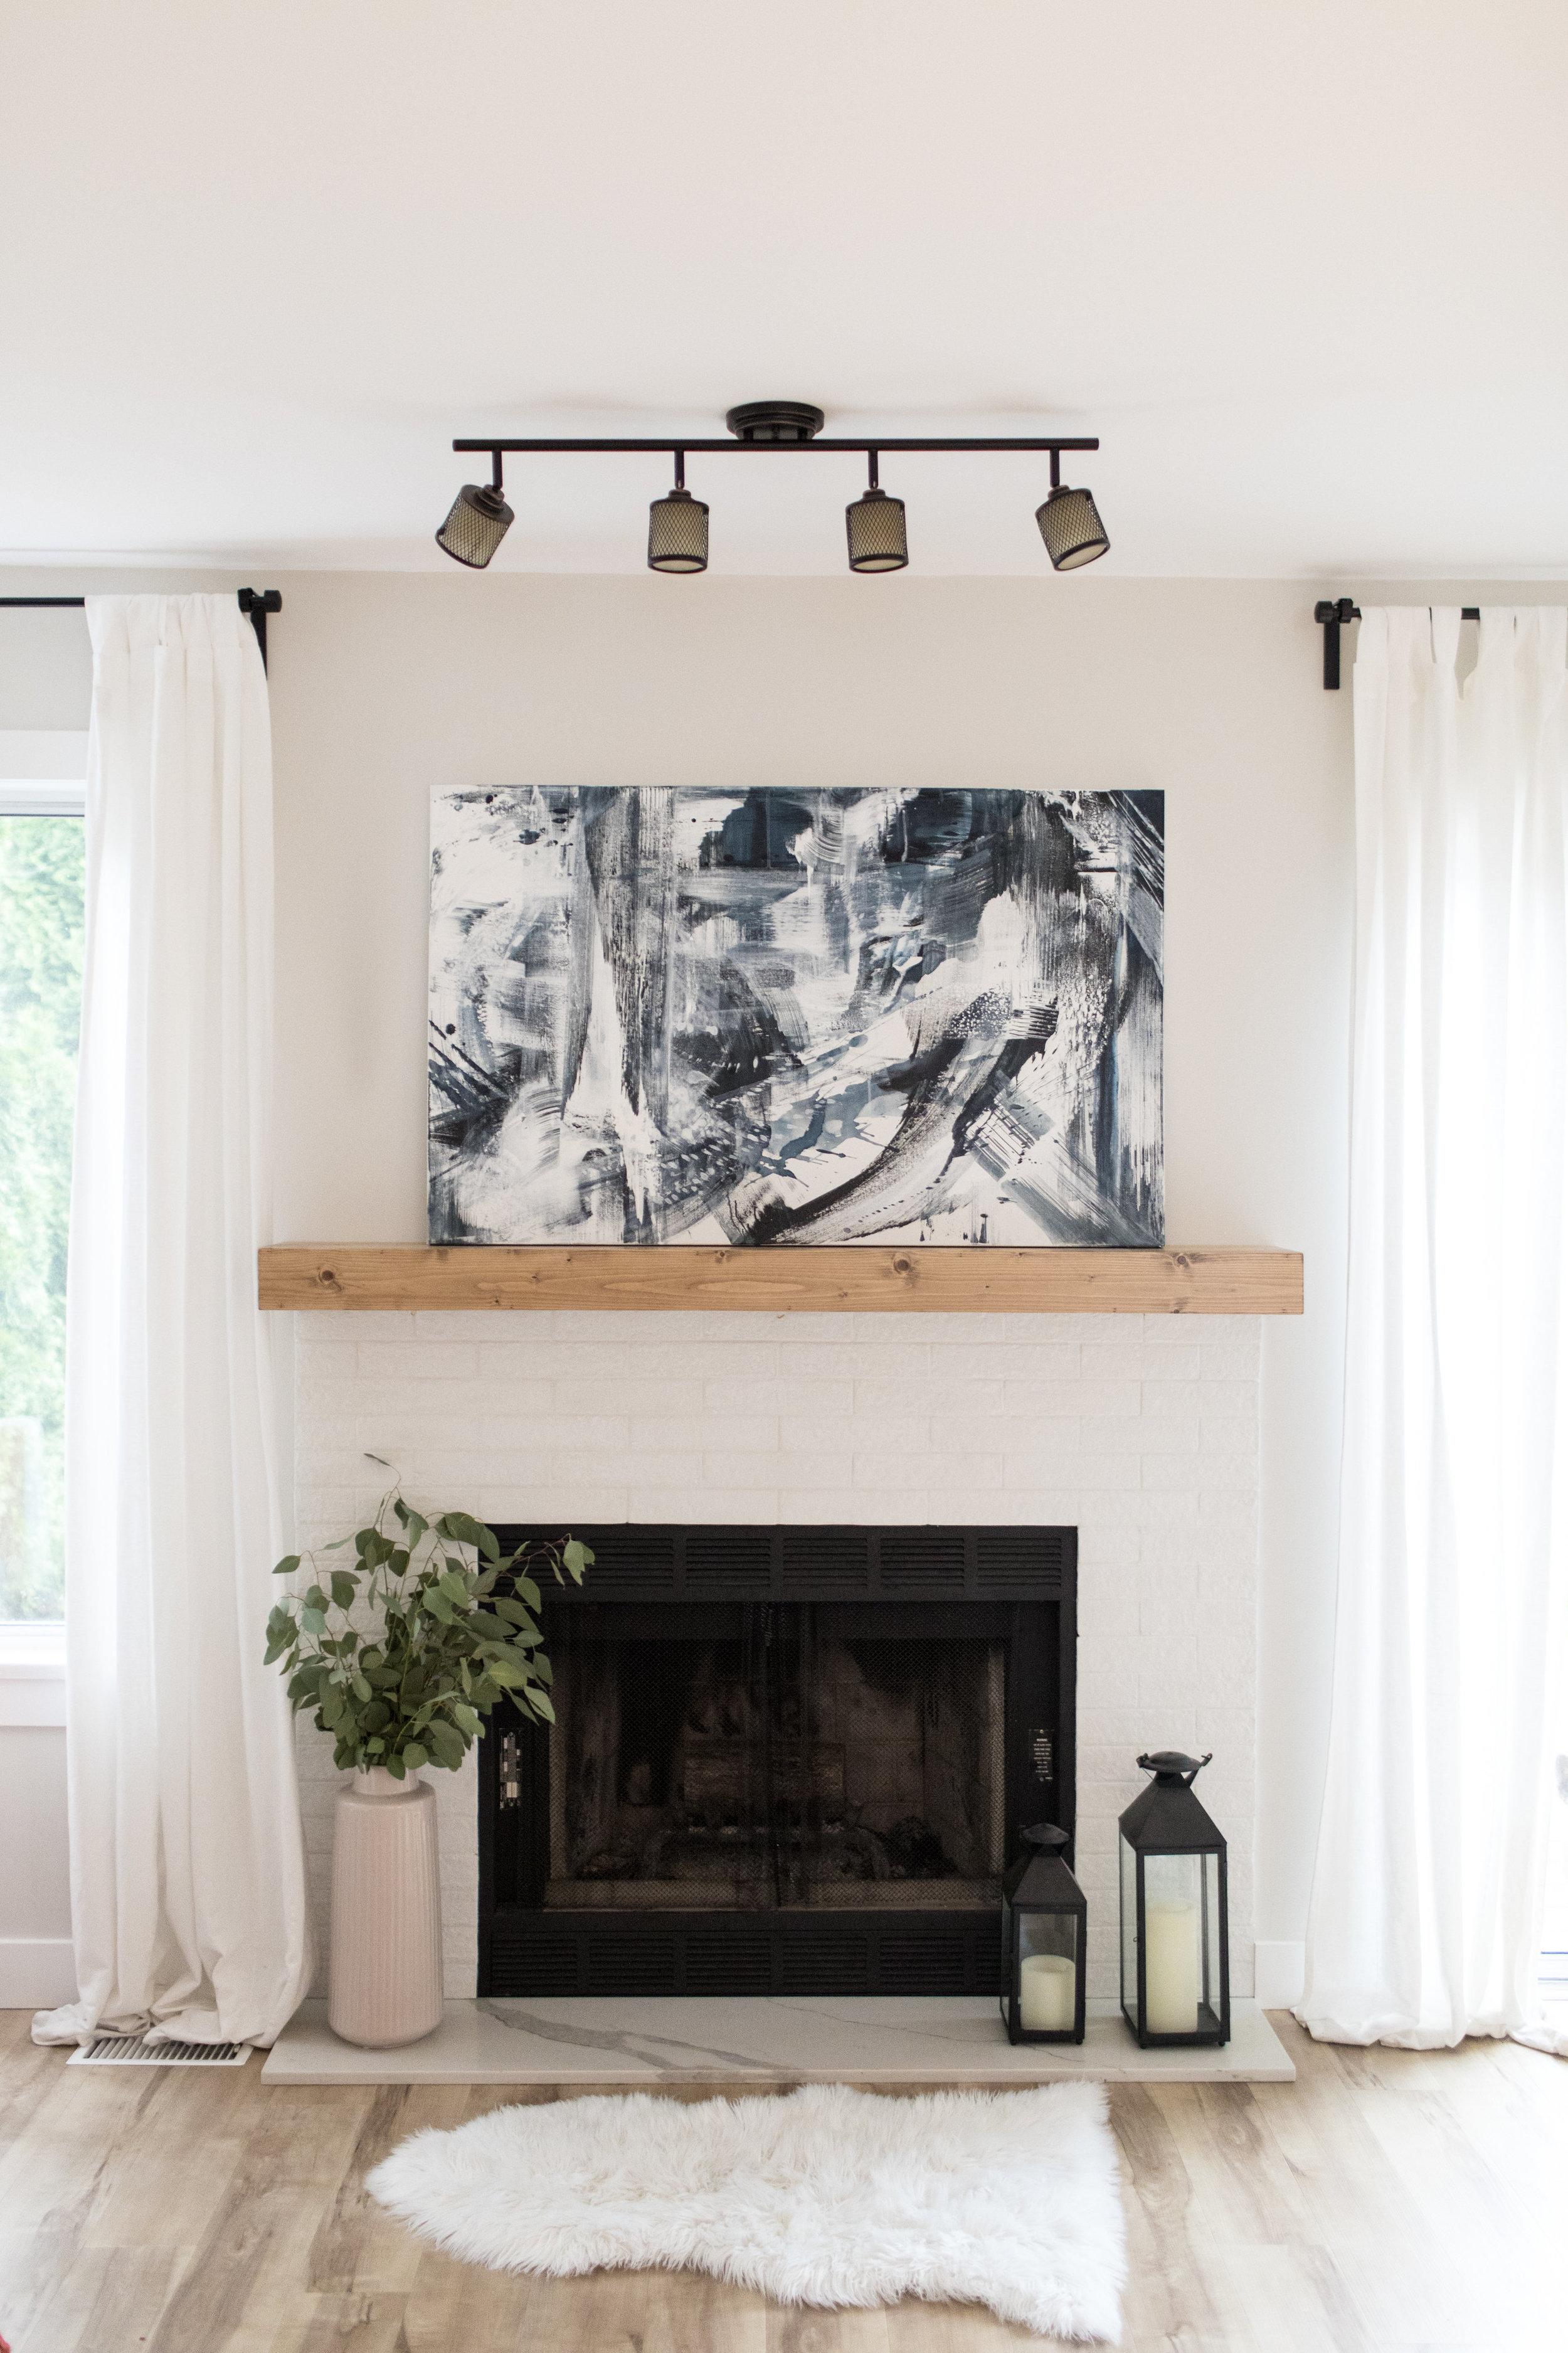 Dana-Mooney-Vancouver-Artist-Clashing-Waves-Styled-Fireplace.jpg